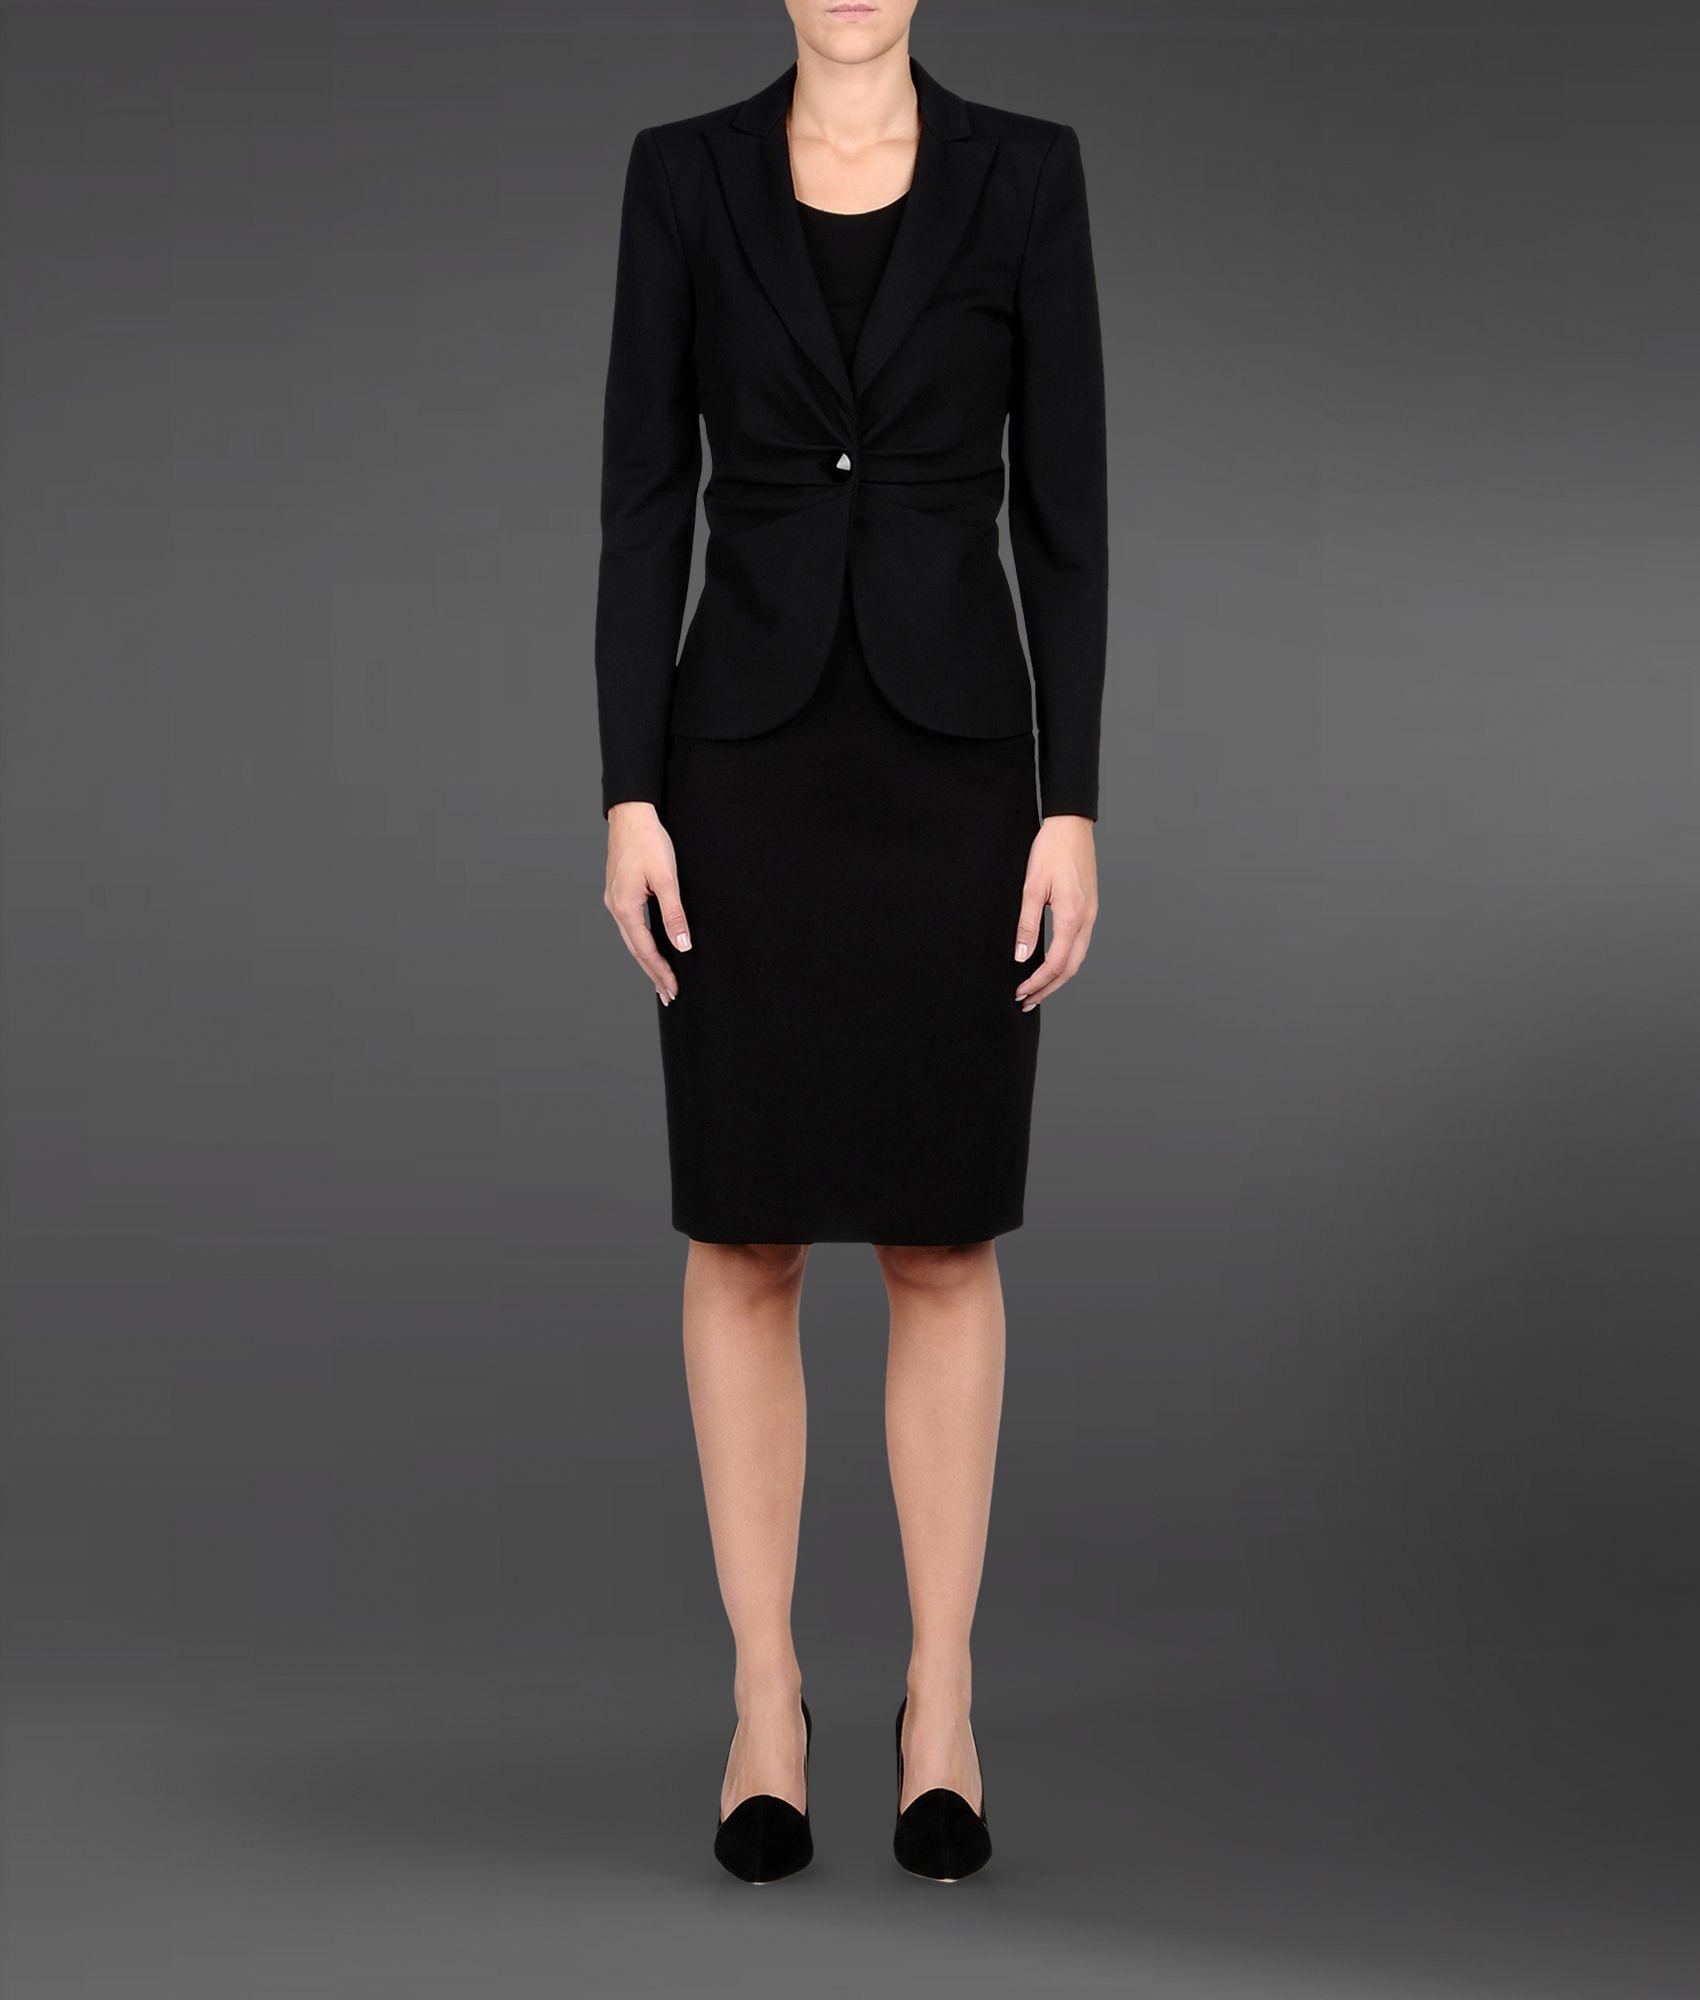 Original WomensPantSuitsTallulah_Tennant_Womens_Suits_Mancester